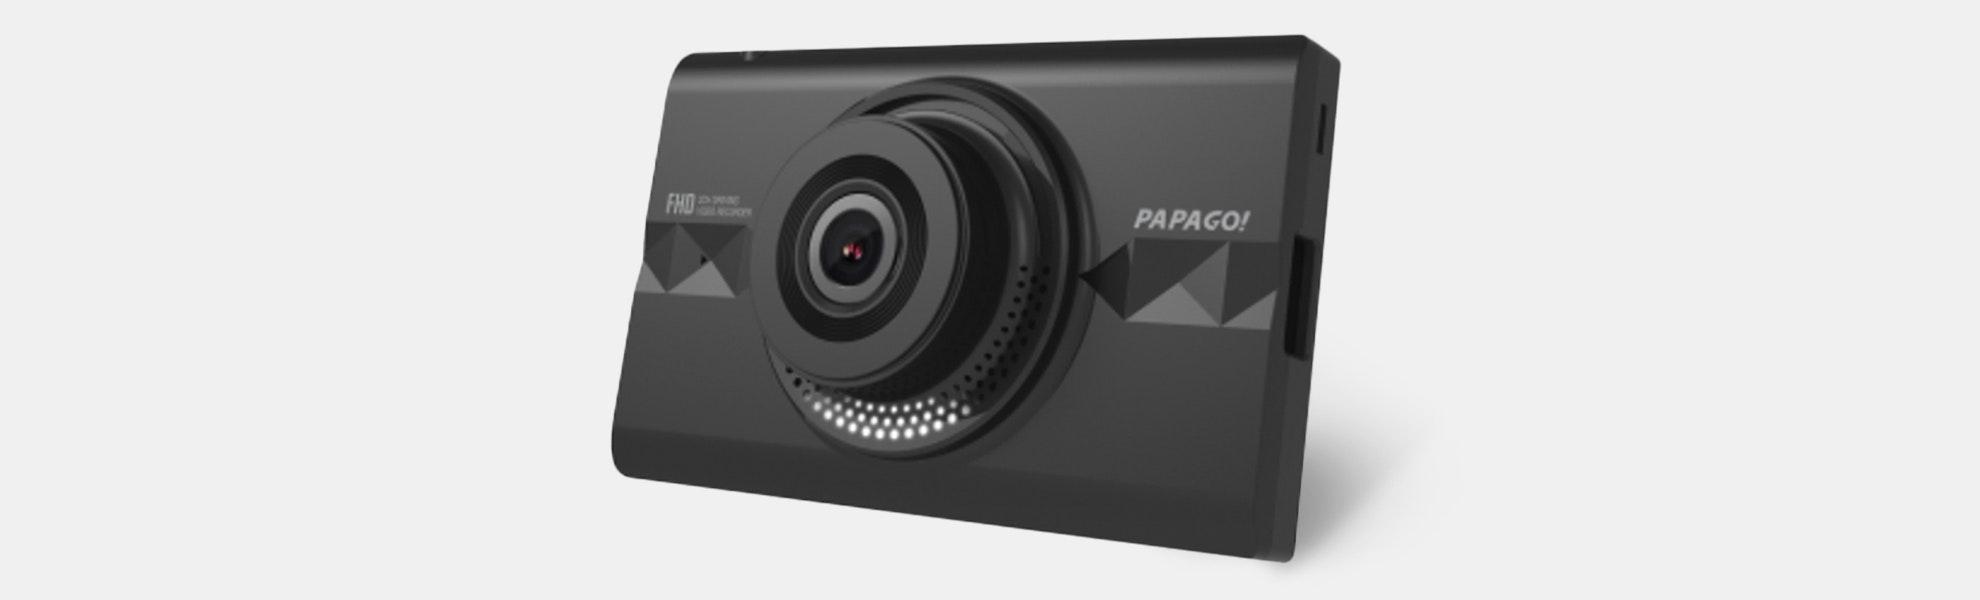 Papago GoSafe 366 1080p Wi-Fi Dash Cam w/ 16GB Card